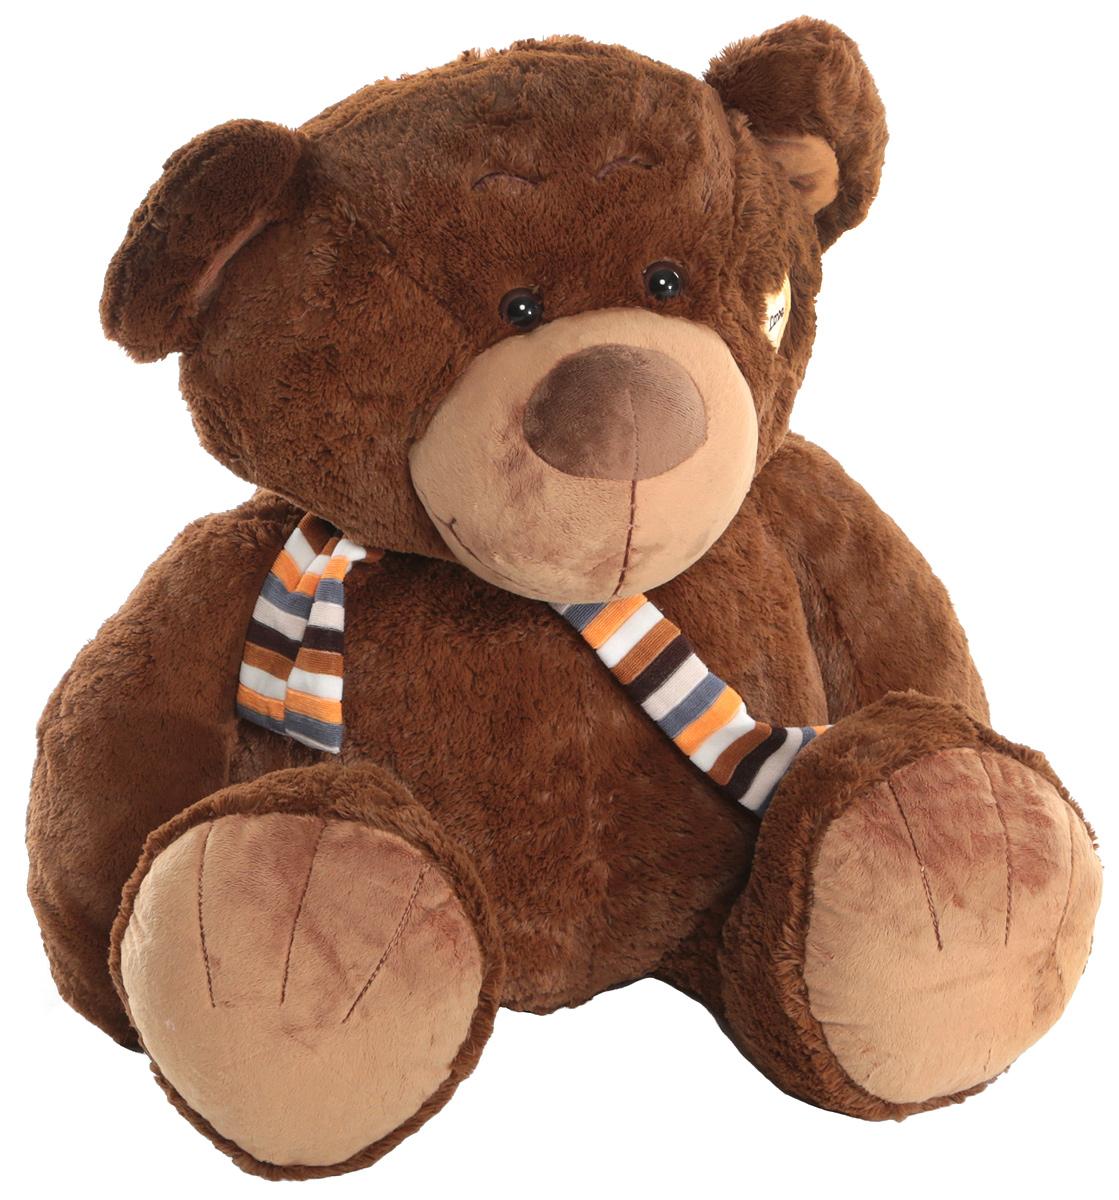 Magic Bear Toys Мягкая игрушка Медвежонок в шарфе цвет коричневый 80 см игрушка мягкая медвежонок mister christmas игрушка мягкая медвежонок page 6 page 15 page 3